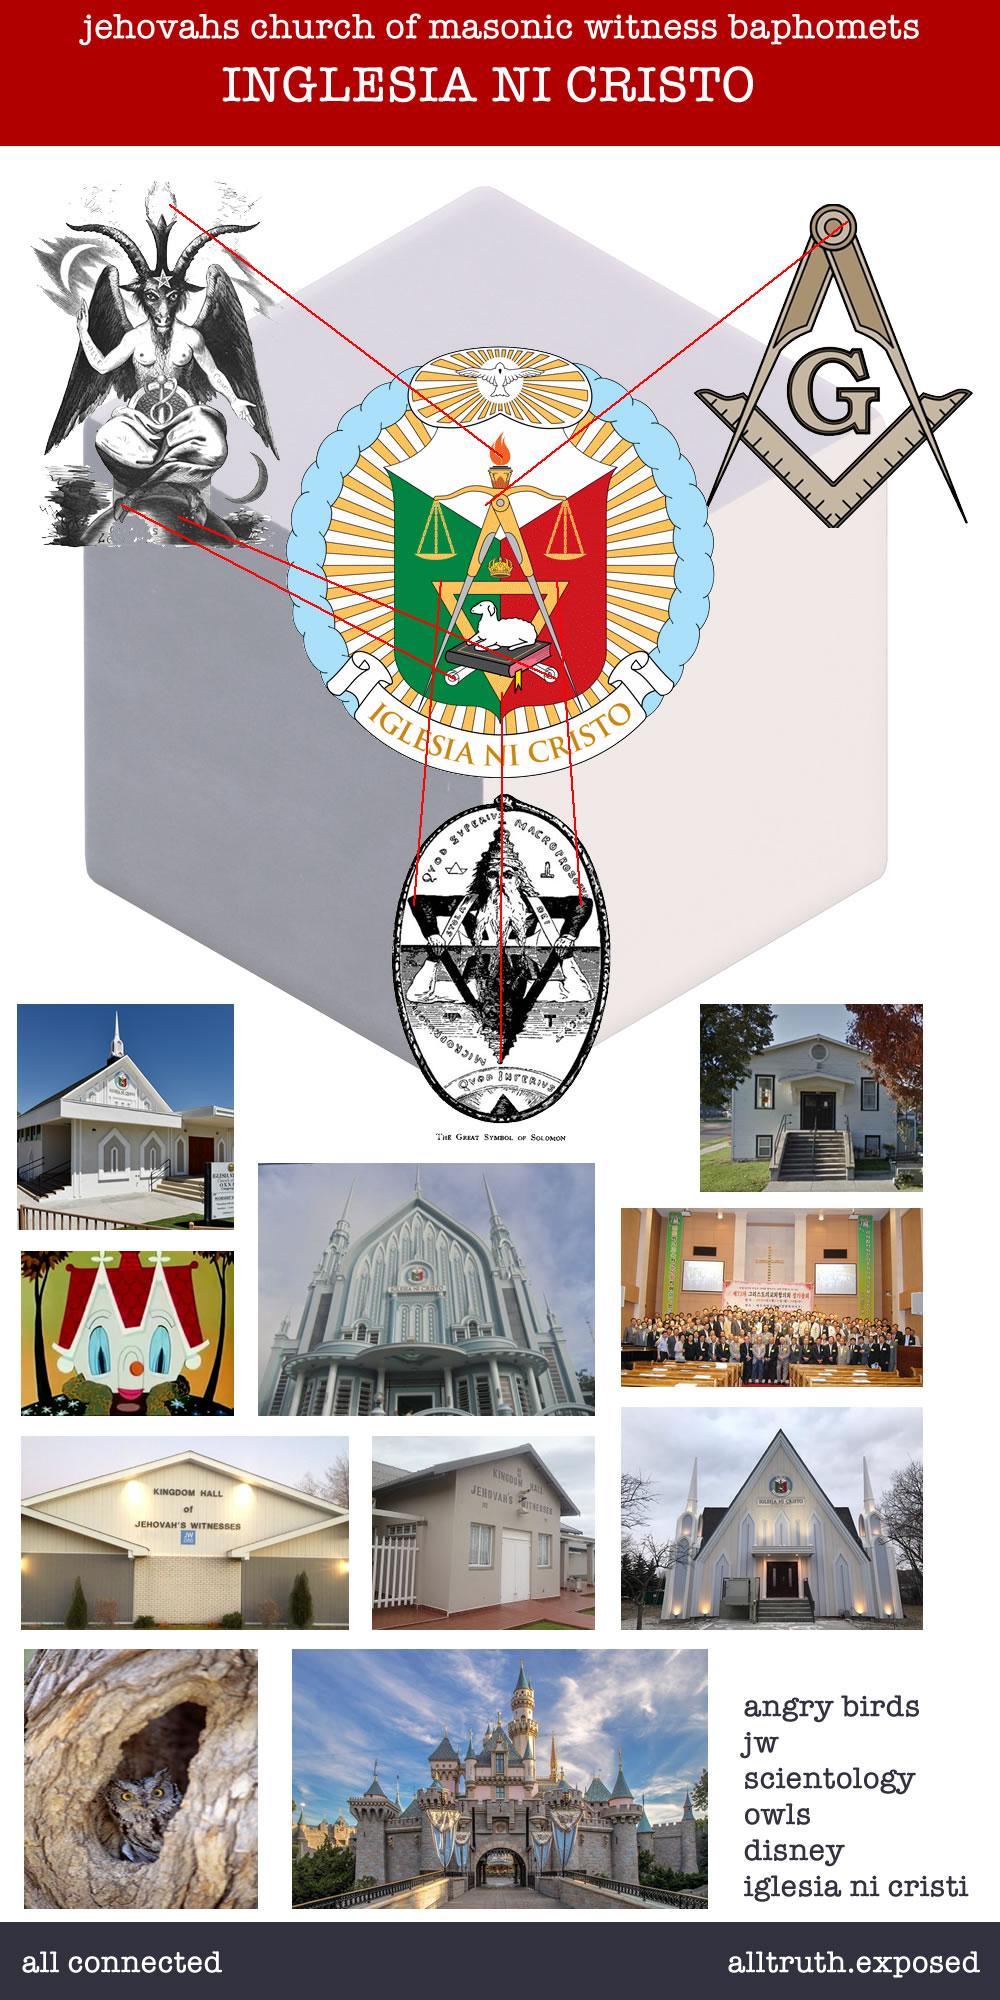 iglesia ni cristo cult philippines freemasonry jehovah witness baphomet christian cult